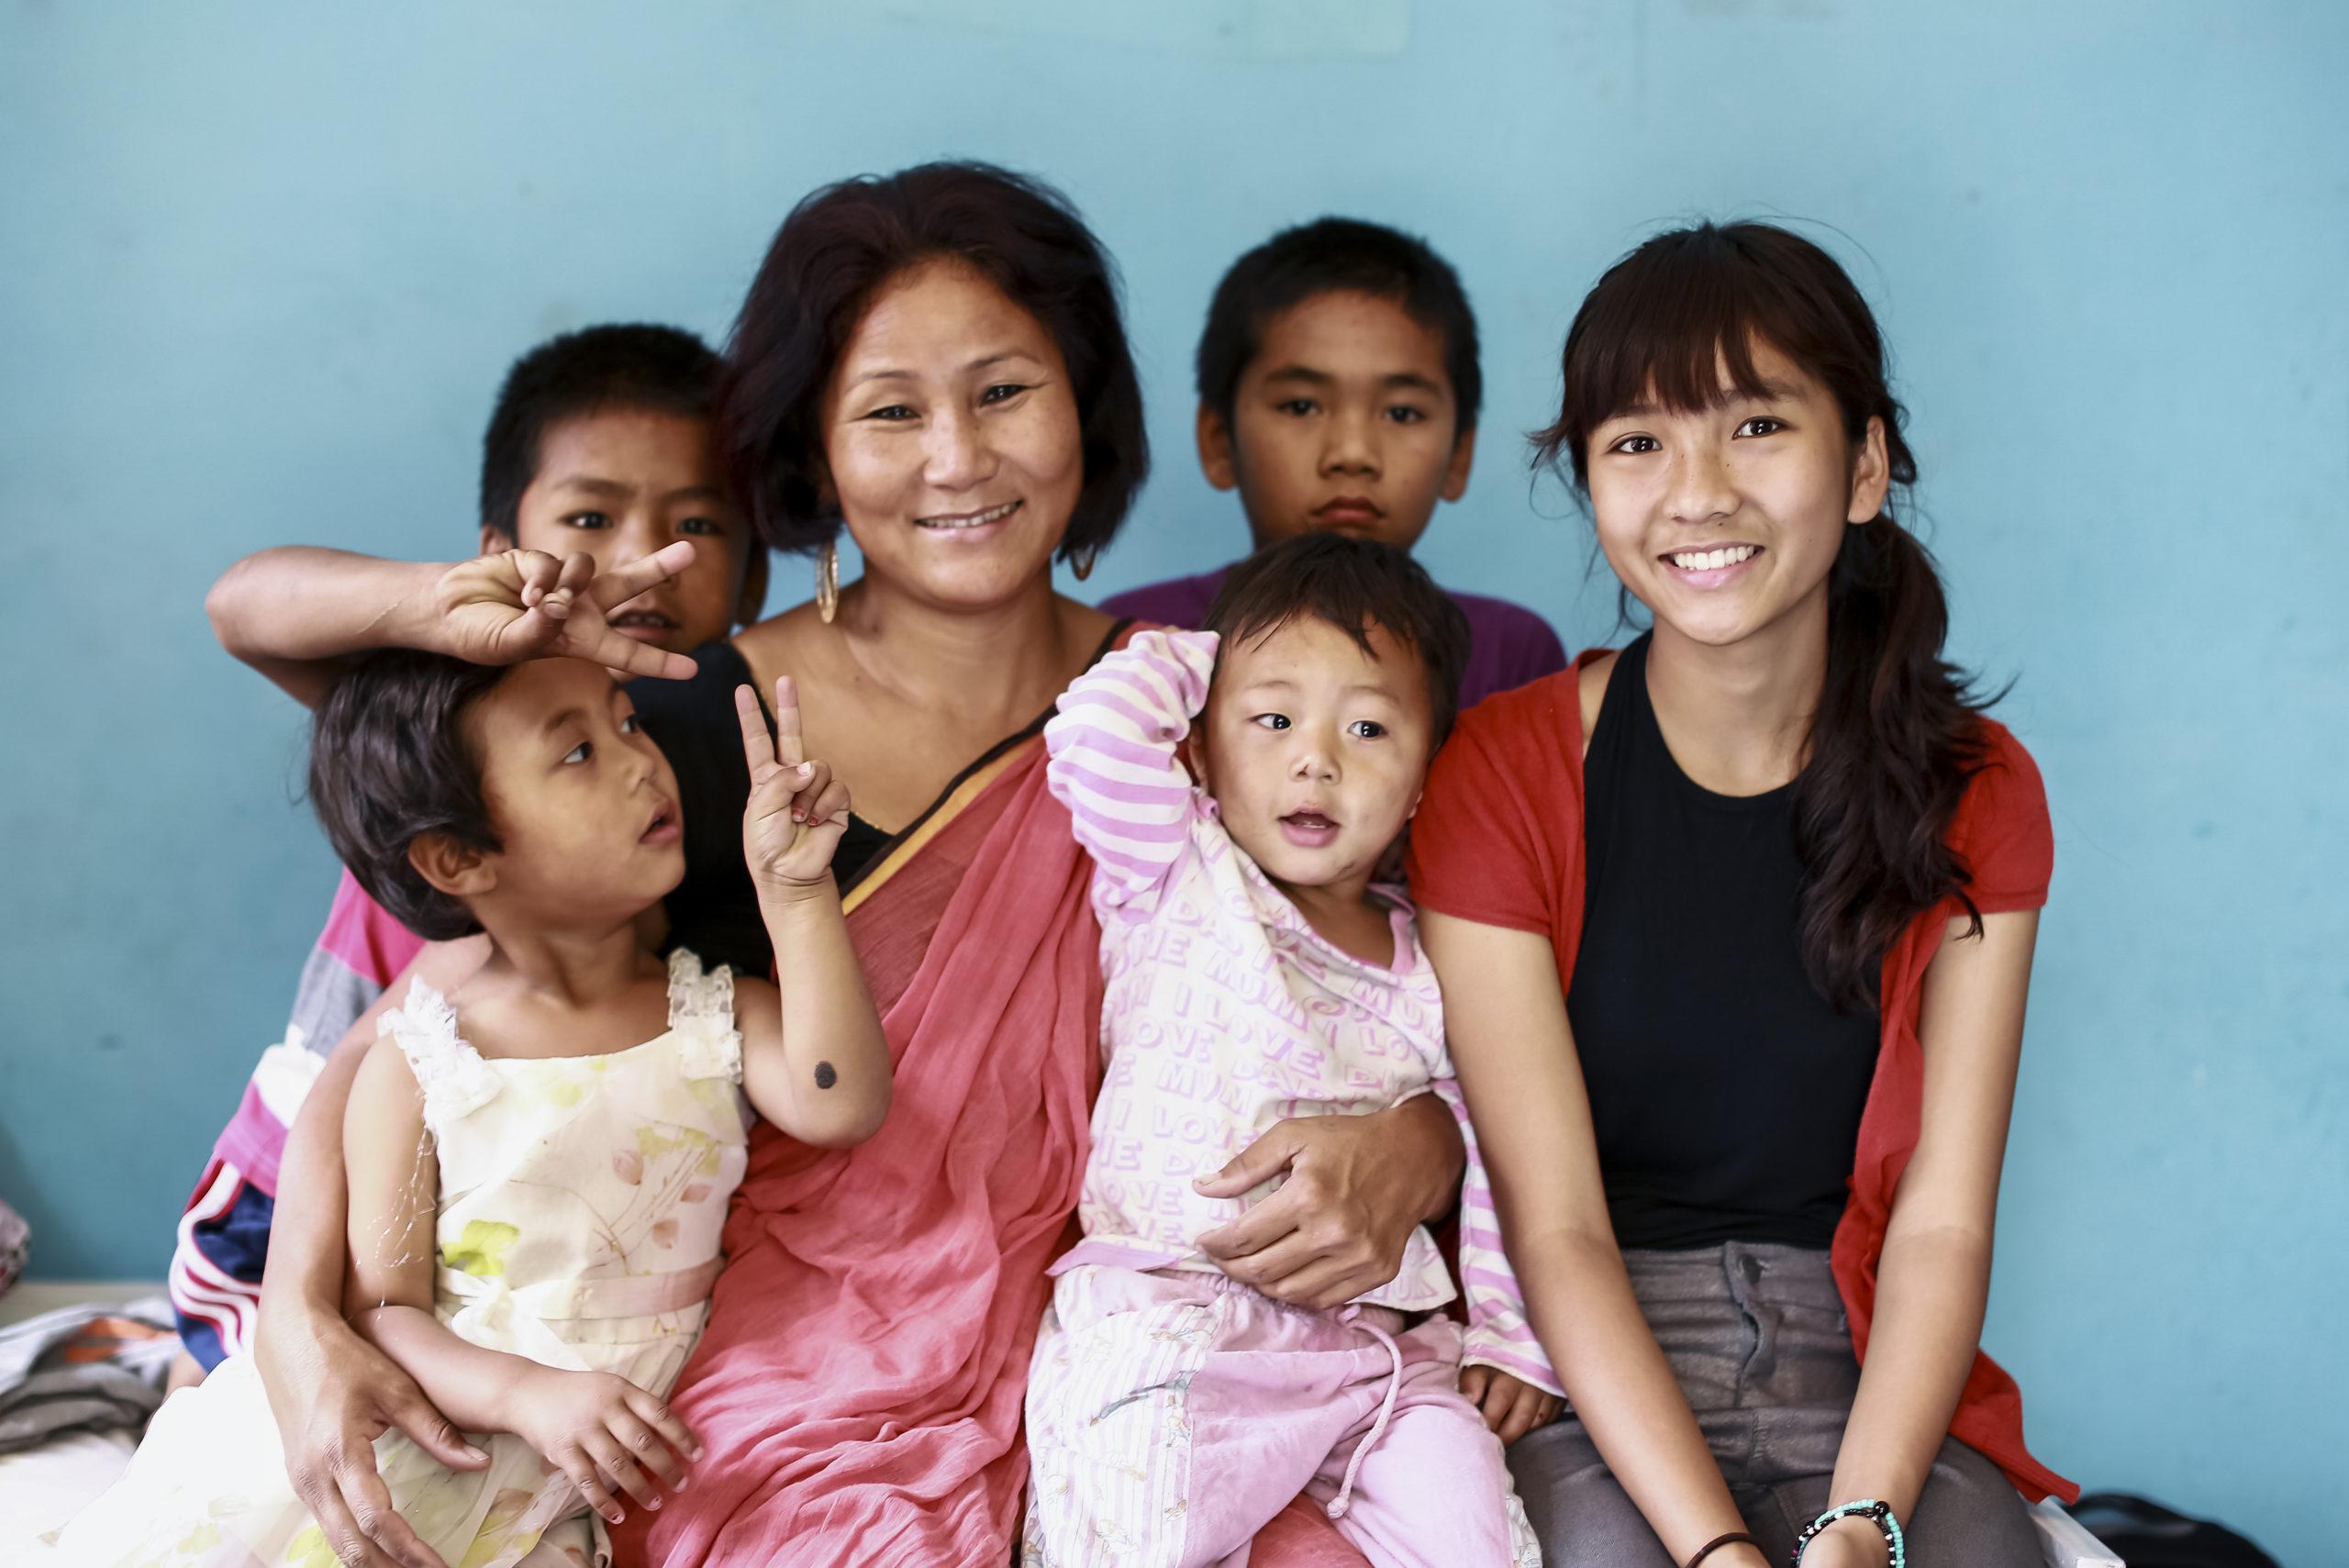 indira-ranamagar-with-children.jpg